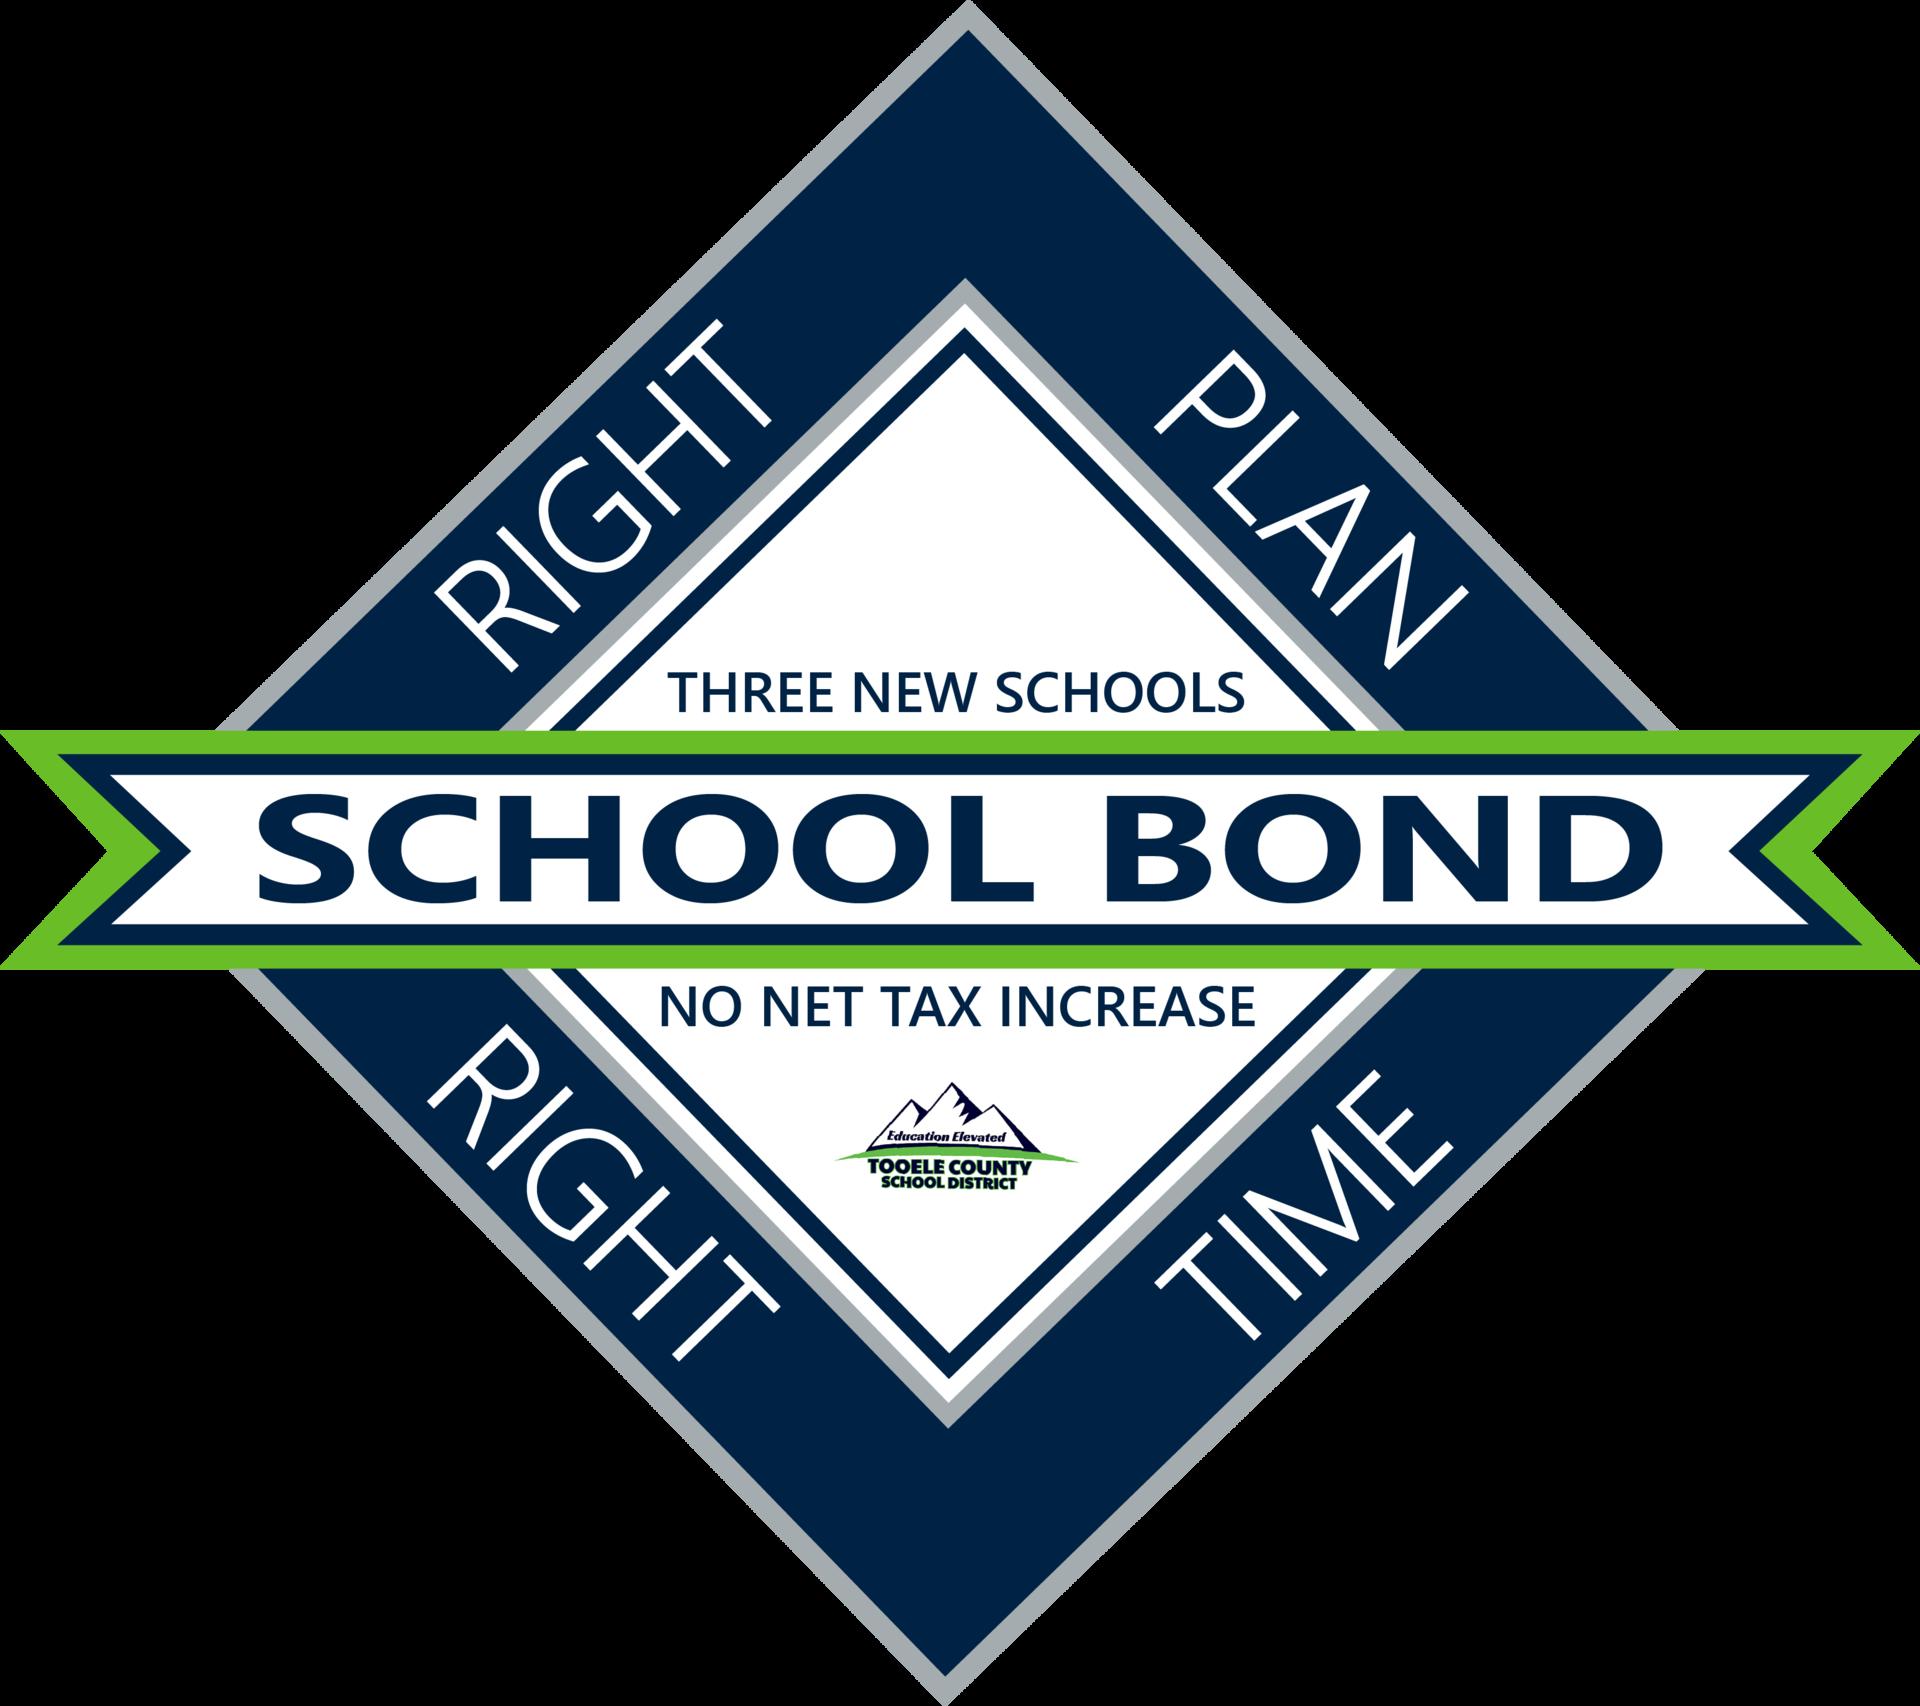 2020 School Bond